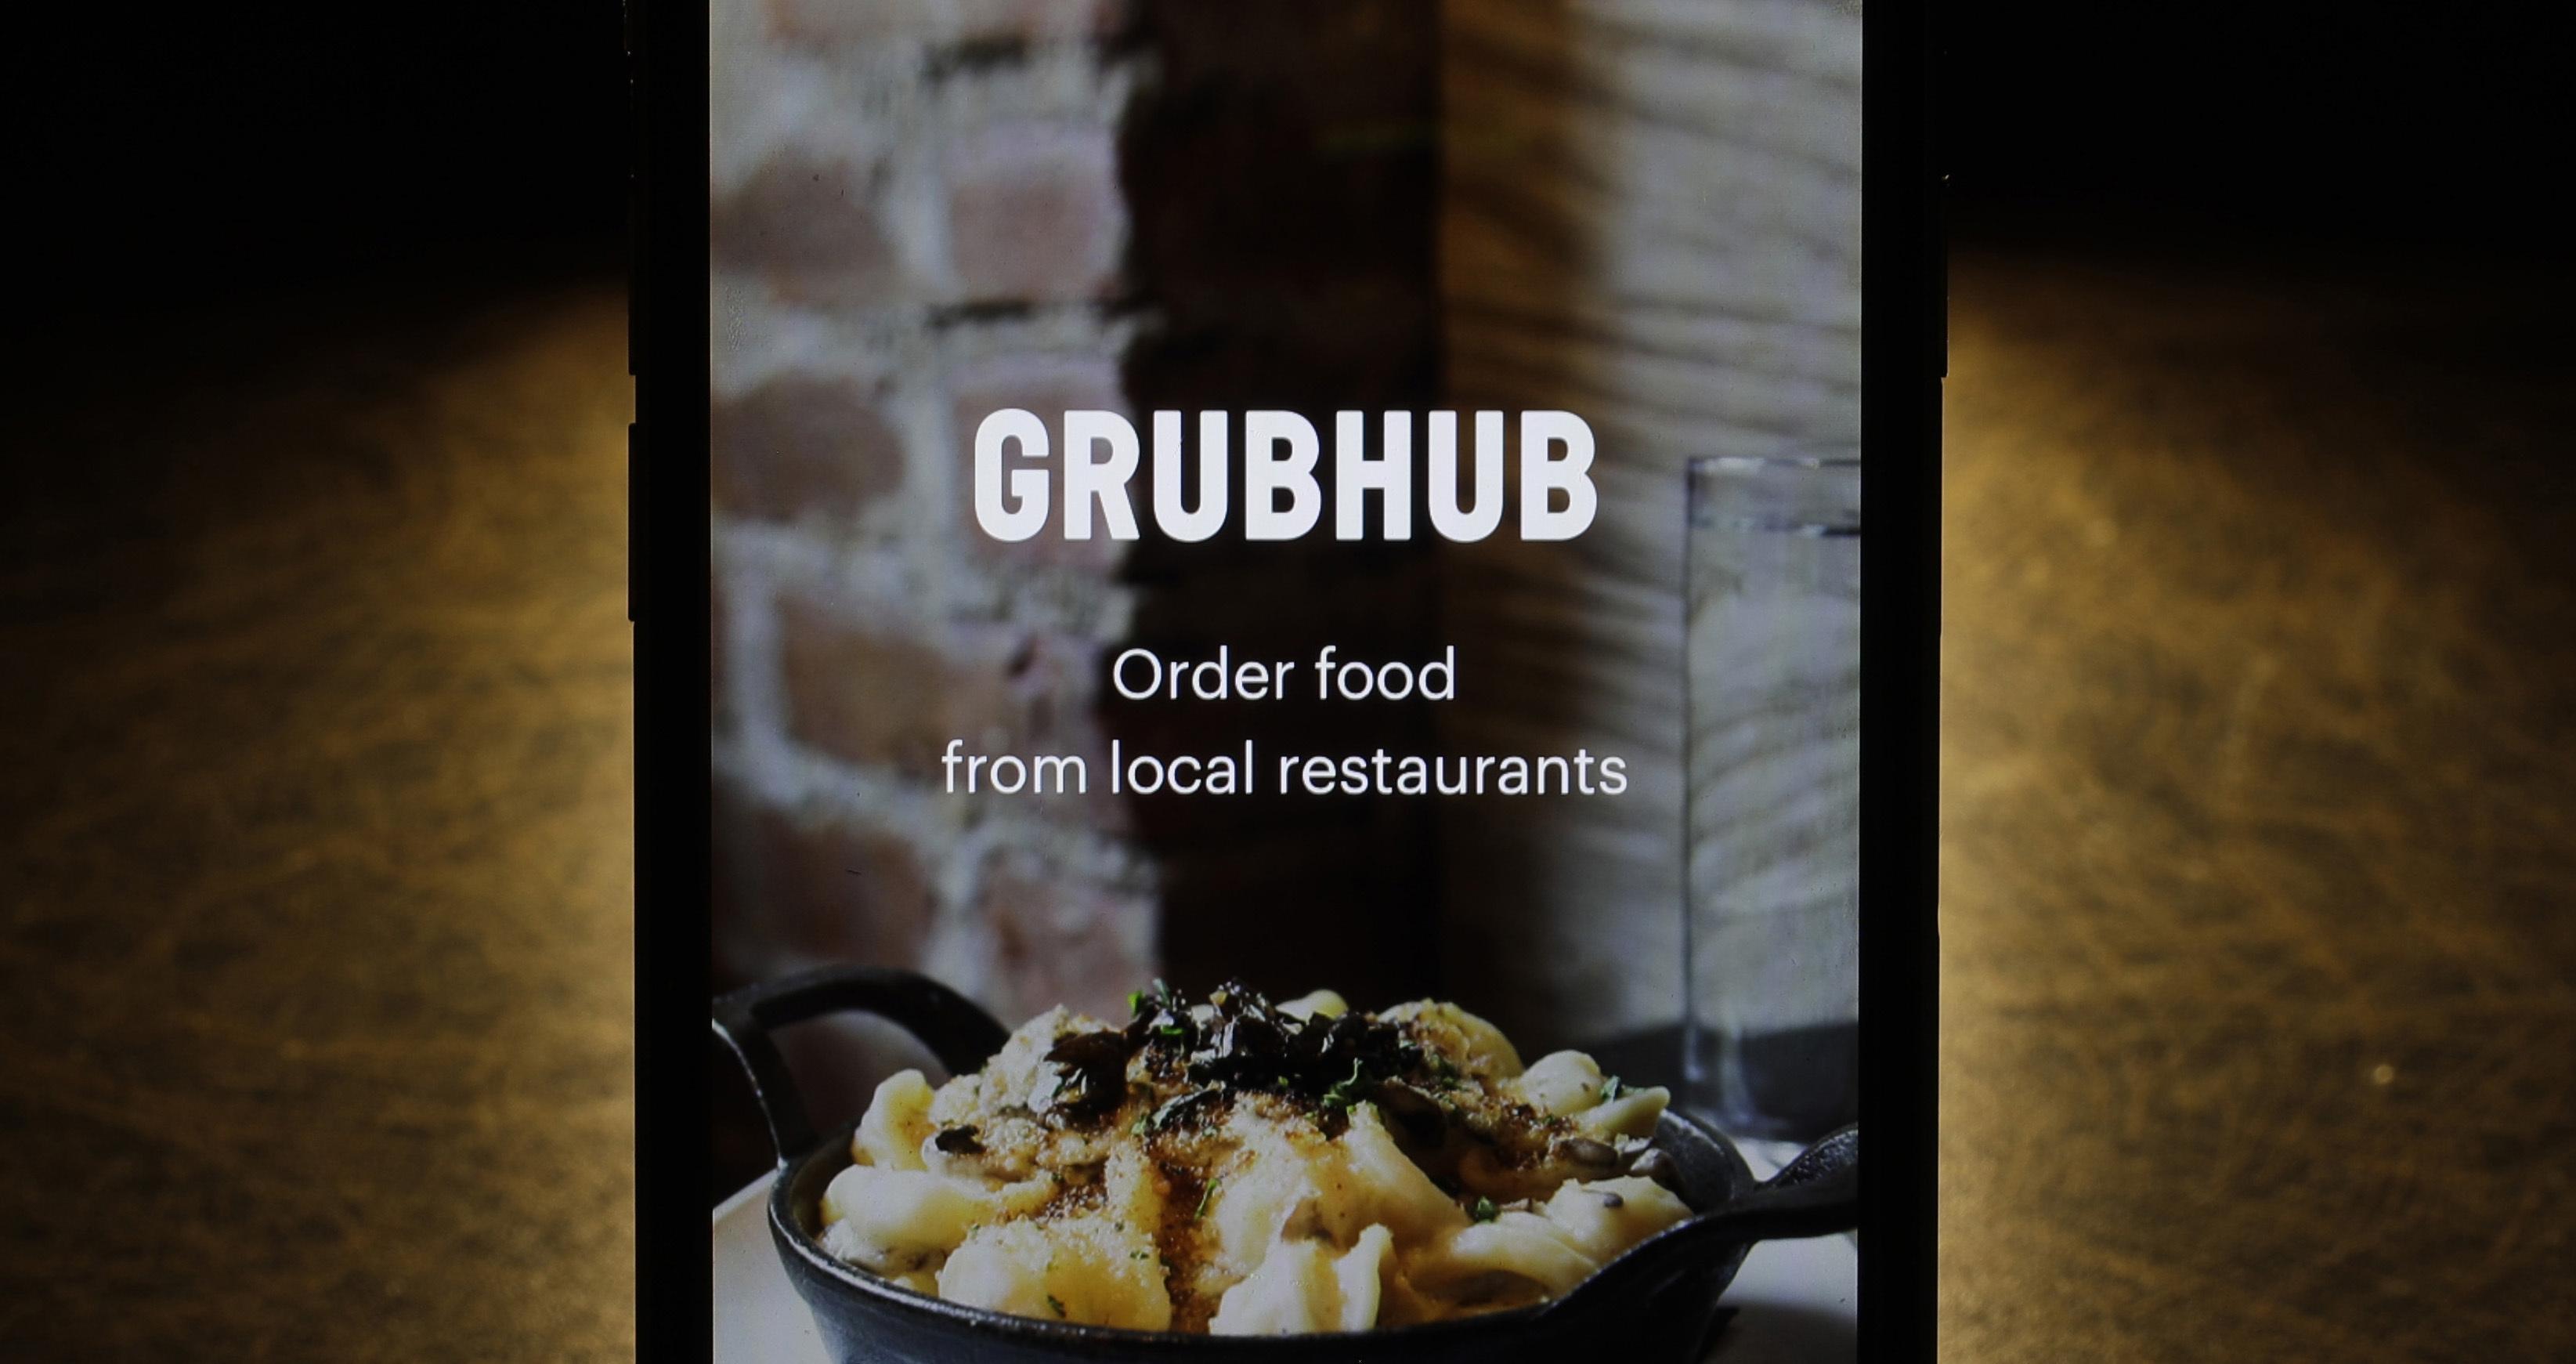 The Grubhub screen on a cellphone.